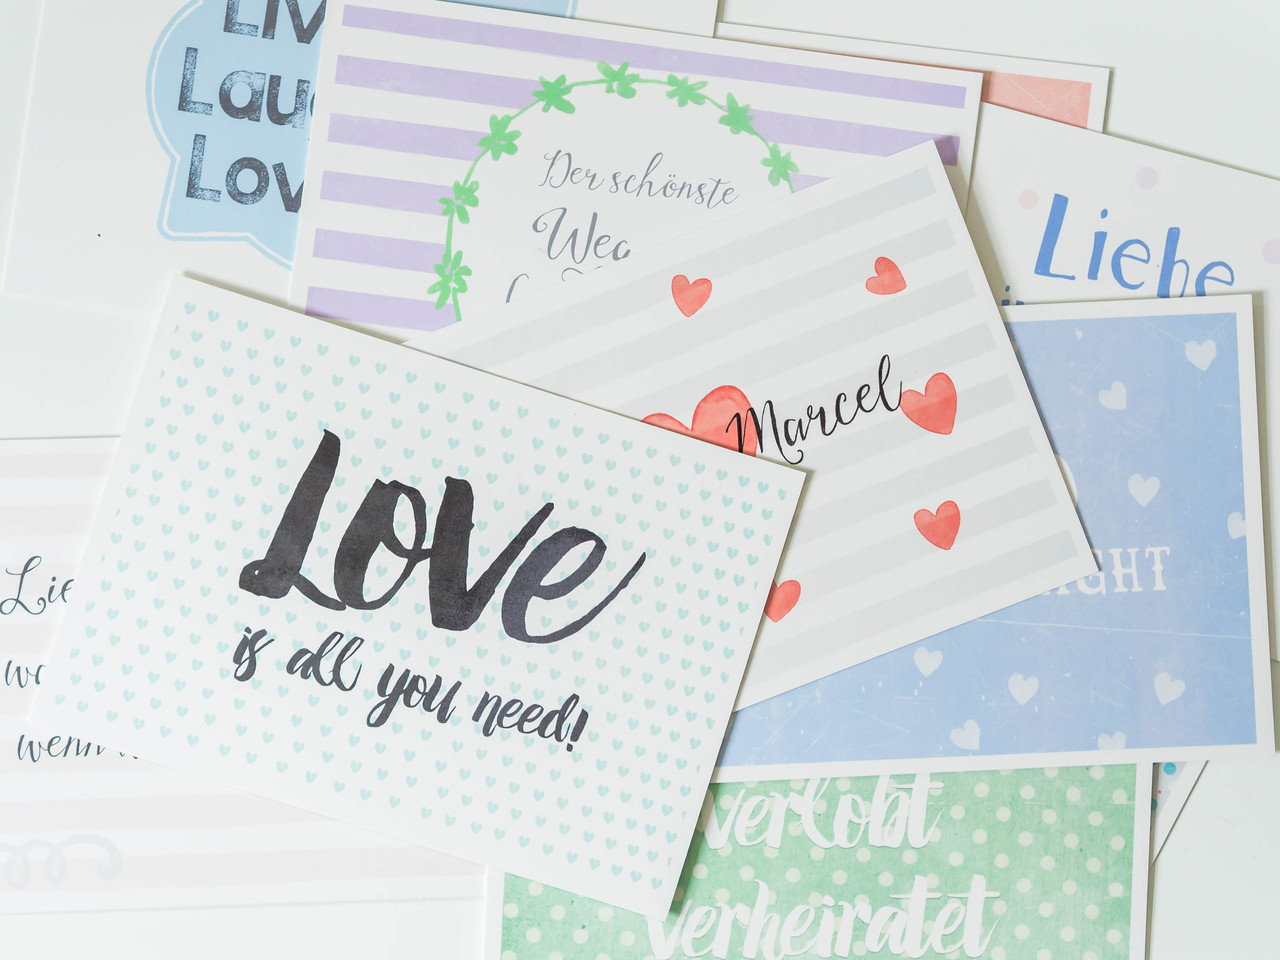 gl ckwunsch karten juhu papeterie liebevoll gestaltete postkarten gru karten da freut sich. Black Bedroom Furniture Sets. Home Design Ideas